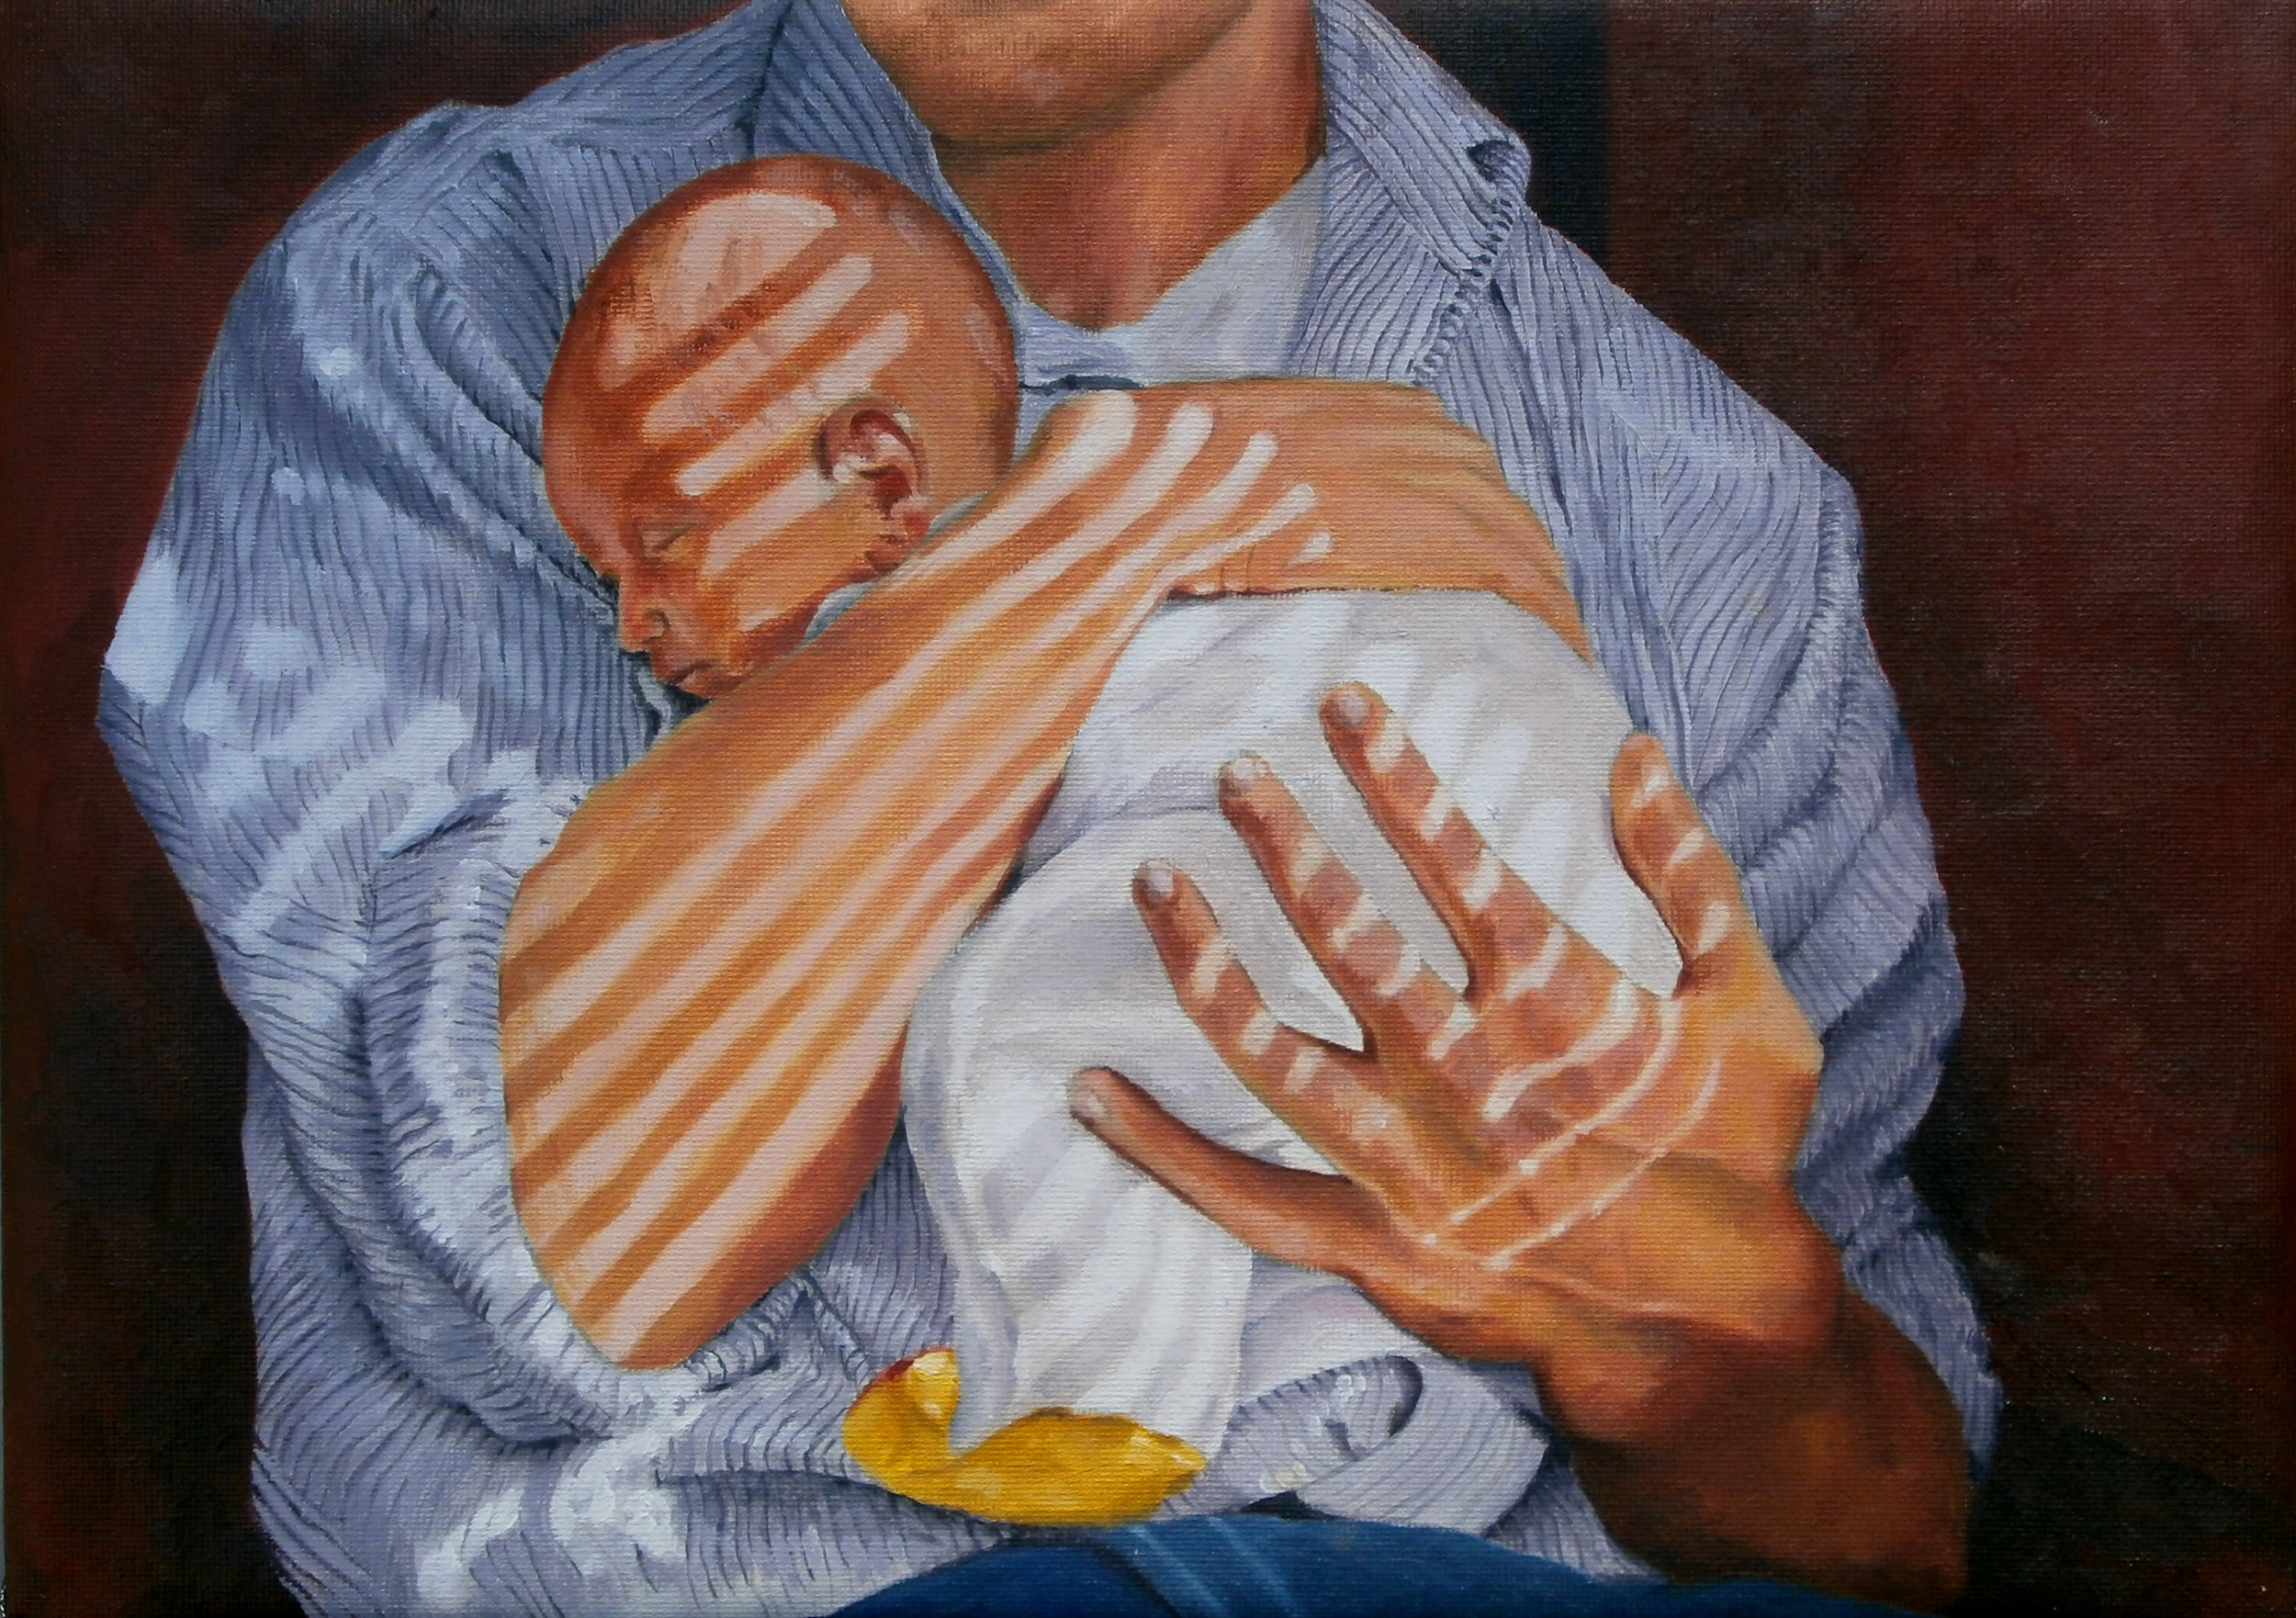 Newborn Wyatt